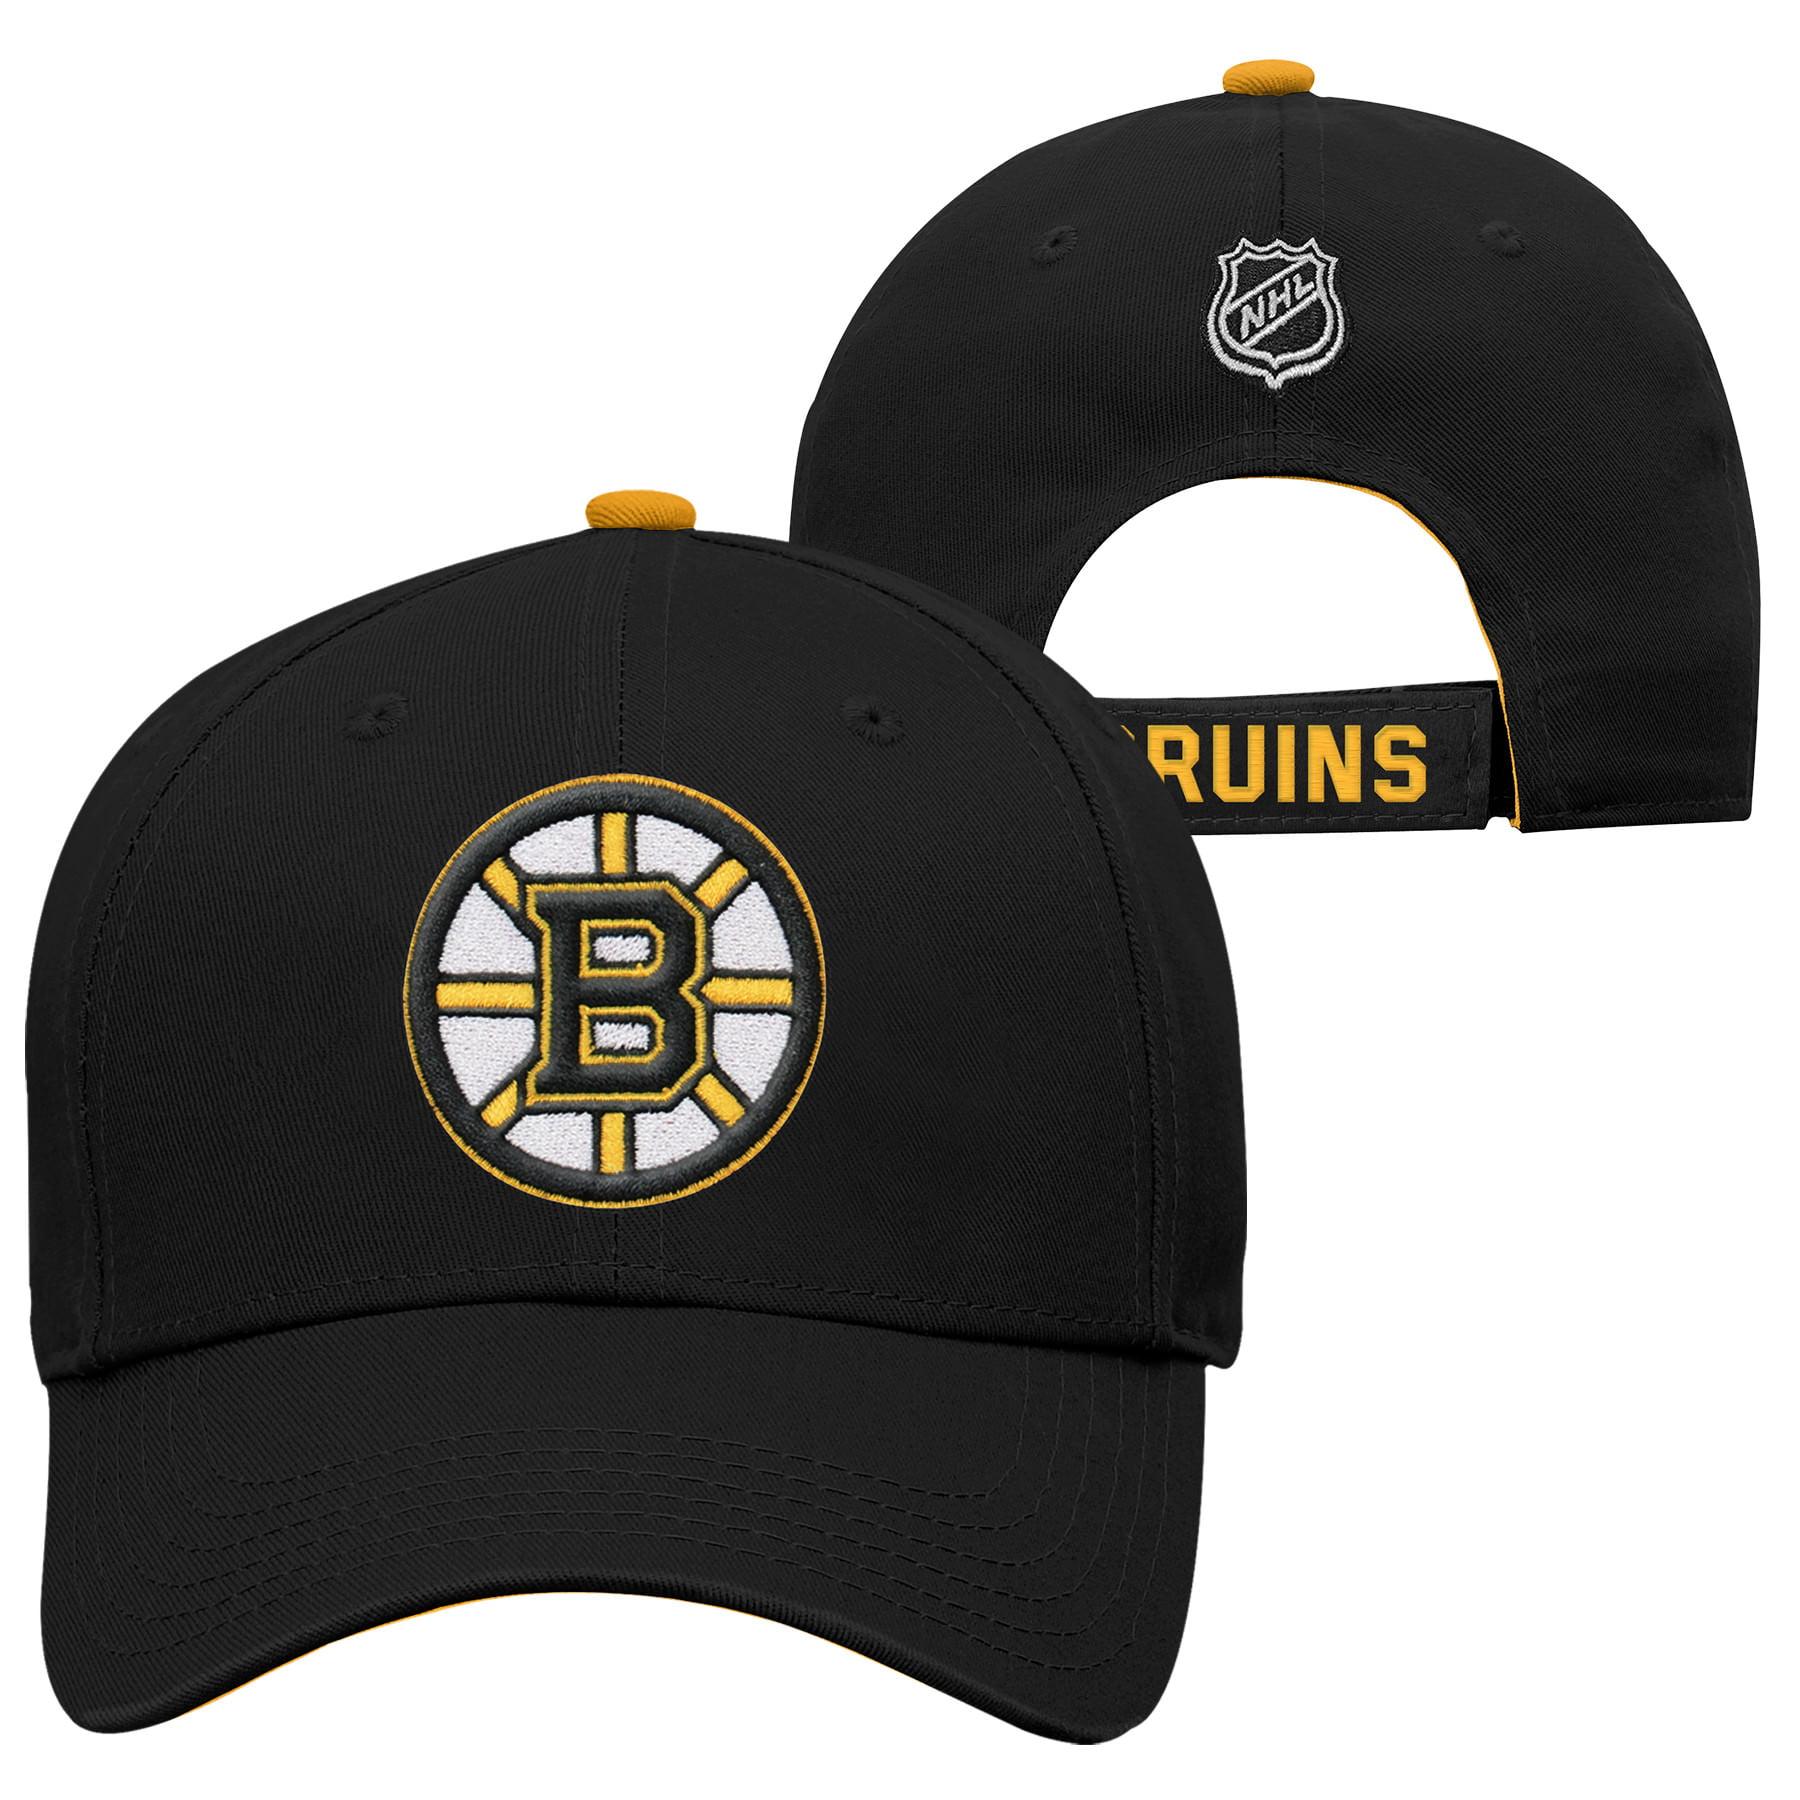 369d9912ddf Outerstuff Youth Boston Bruins NHL Basic Structured Adjustable Cap